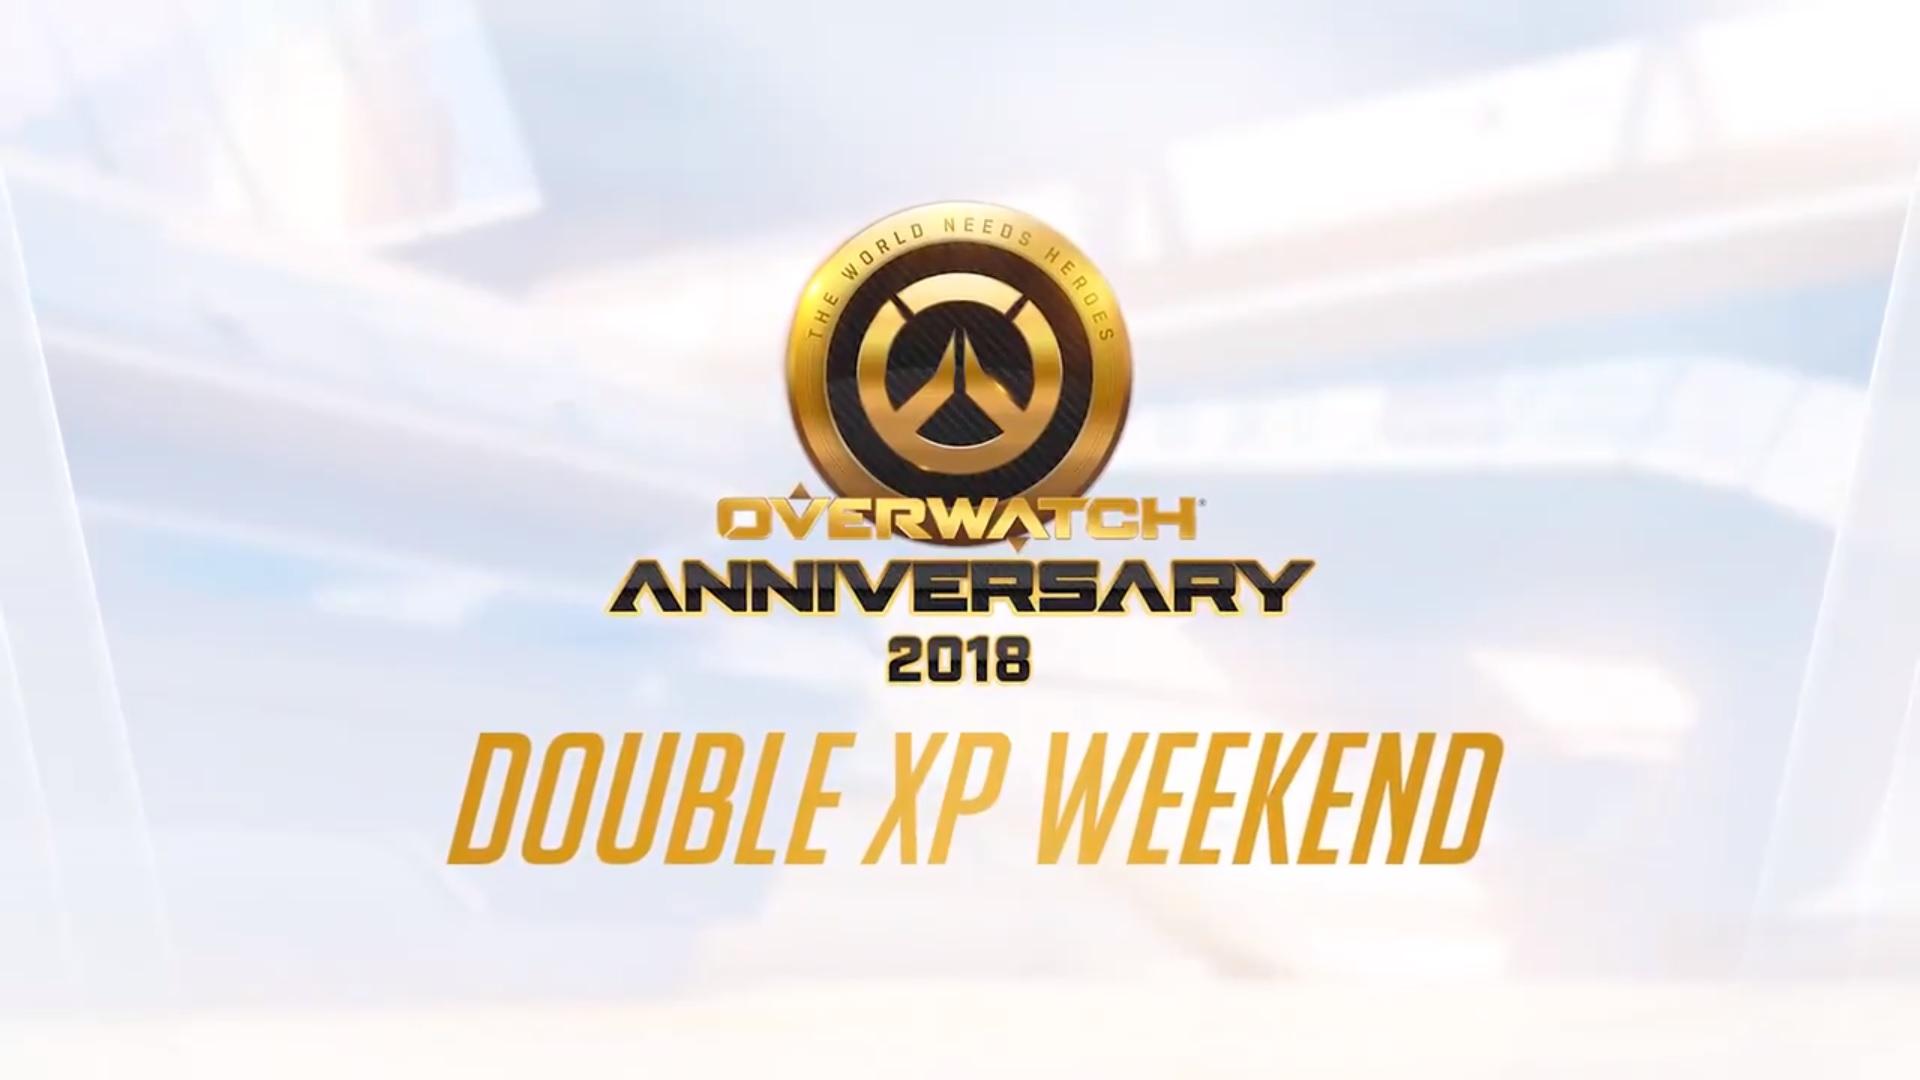 Fin de semana de doble EXP de Overwatch